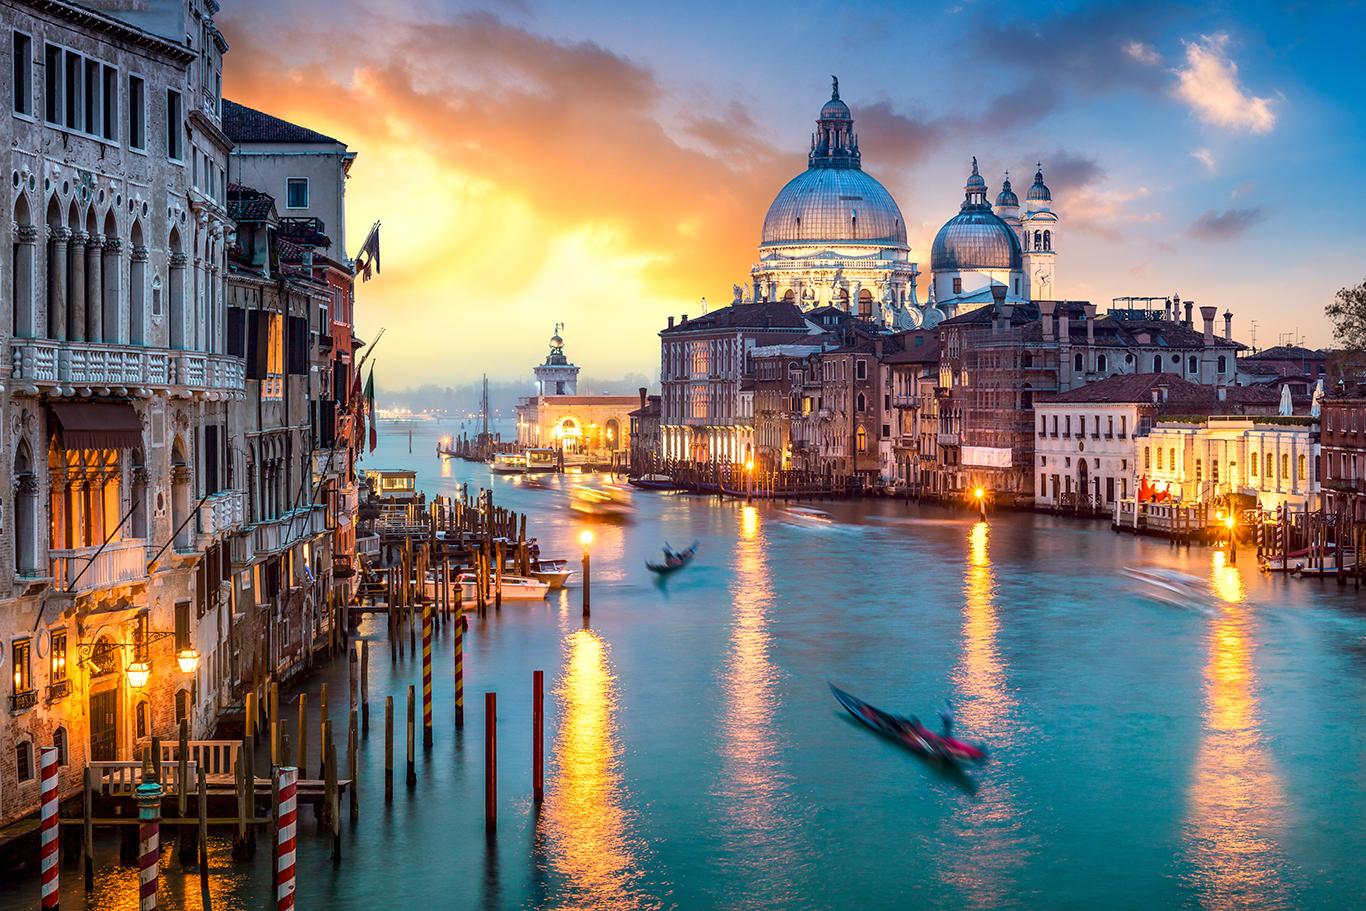 Venedig ab 83 €